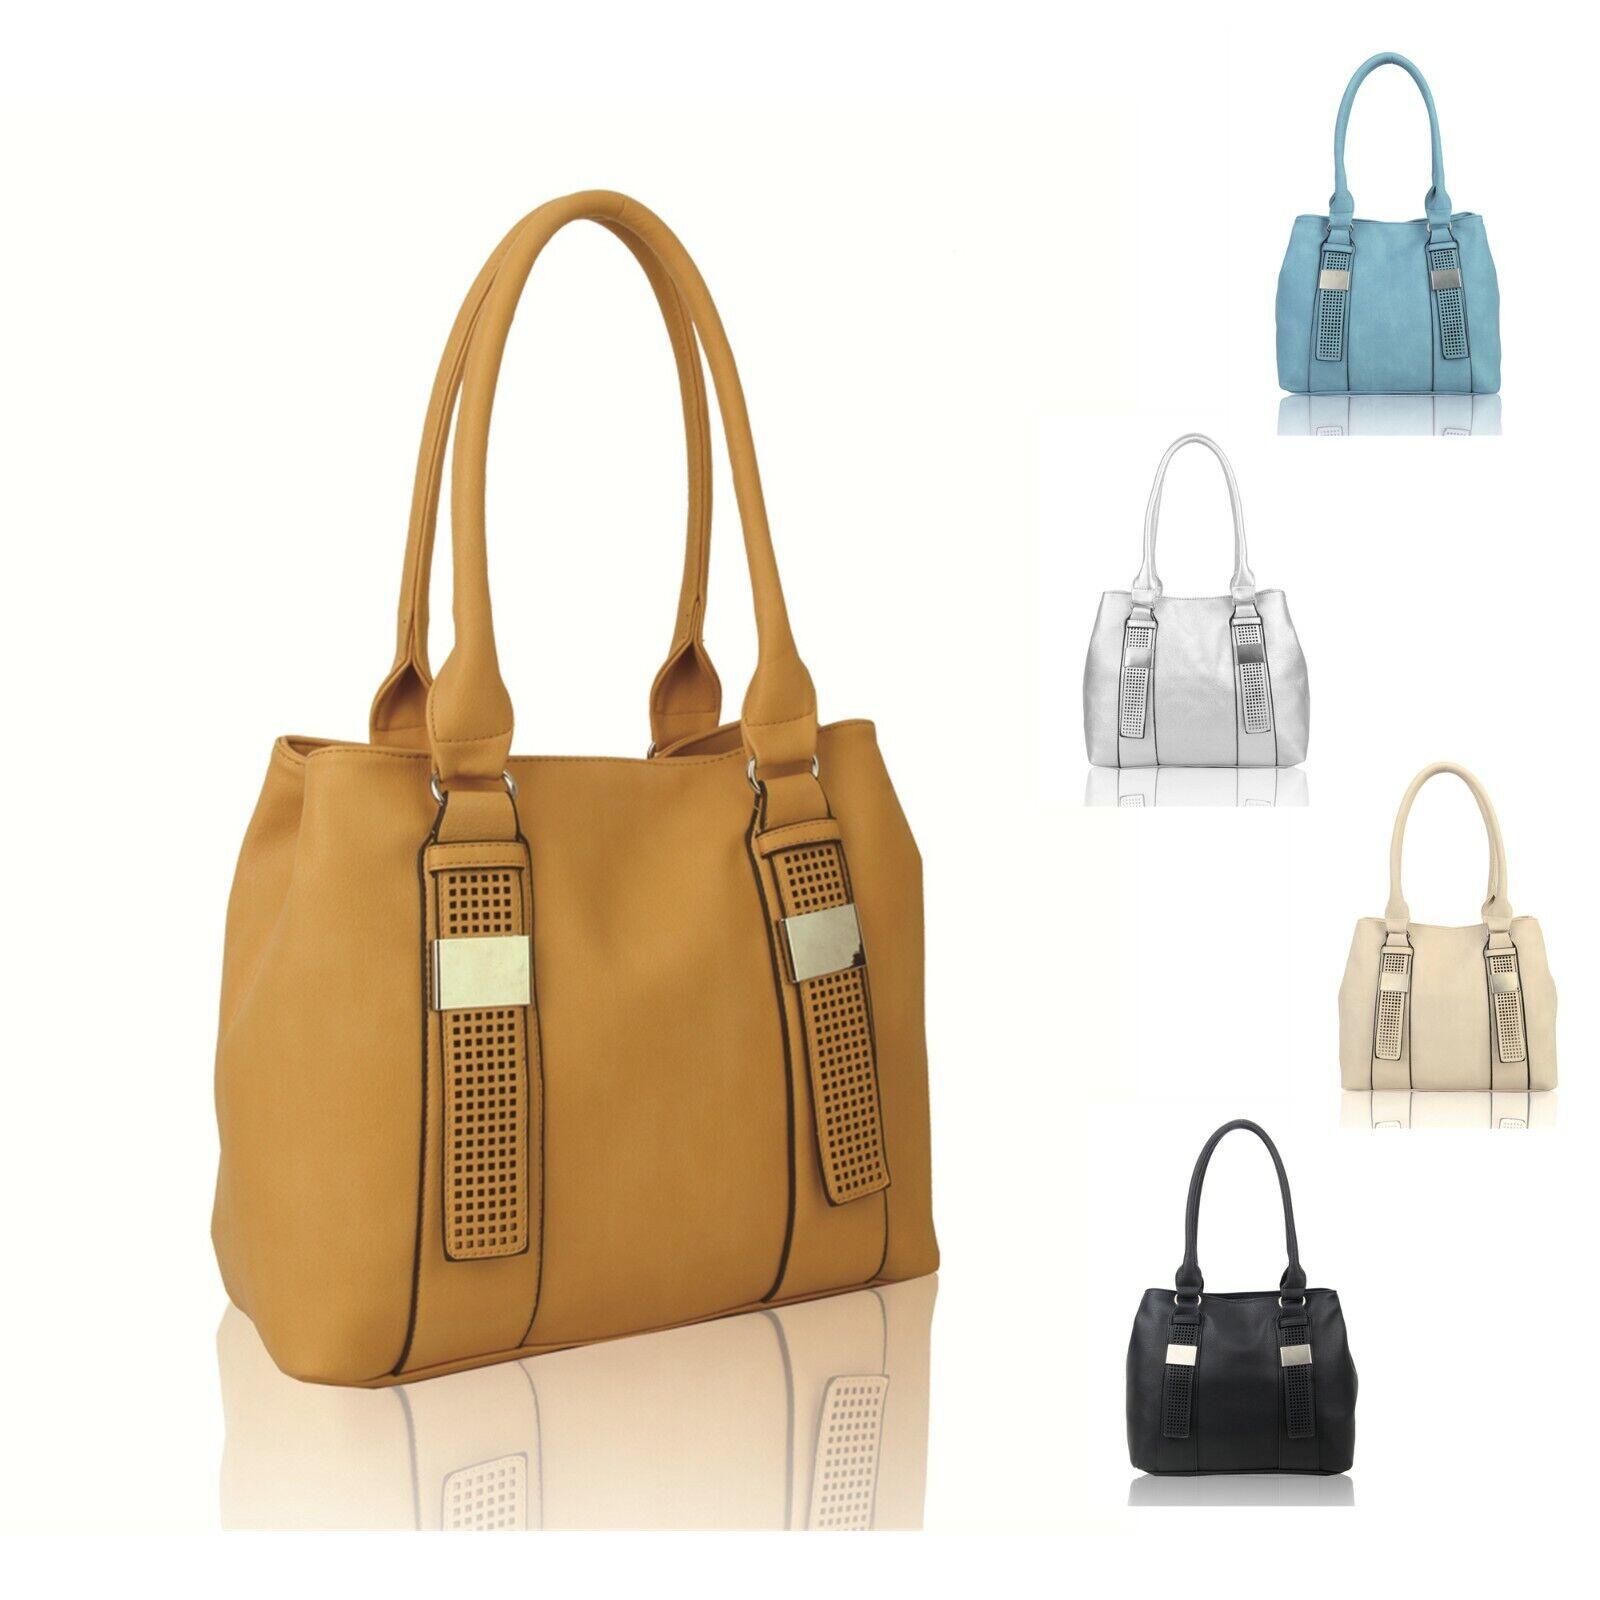 Woman Lady Synthetic Leather Medium Belt-deco Tote Commuting Shoulder Handbag